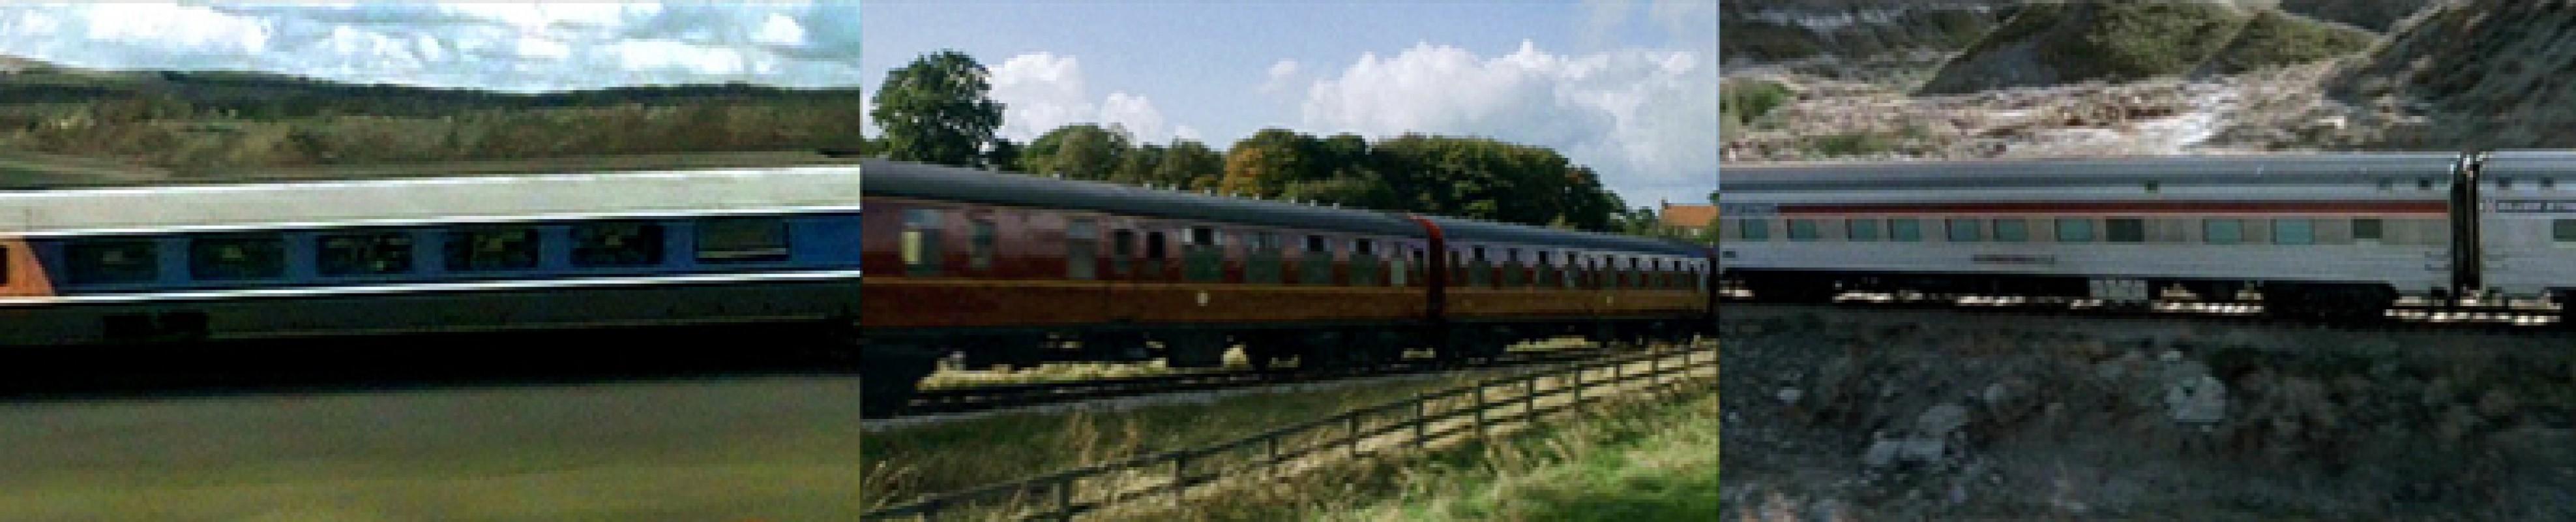 1415885777 girardet mueller locomotive 5